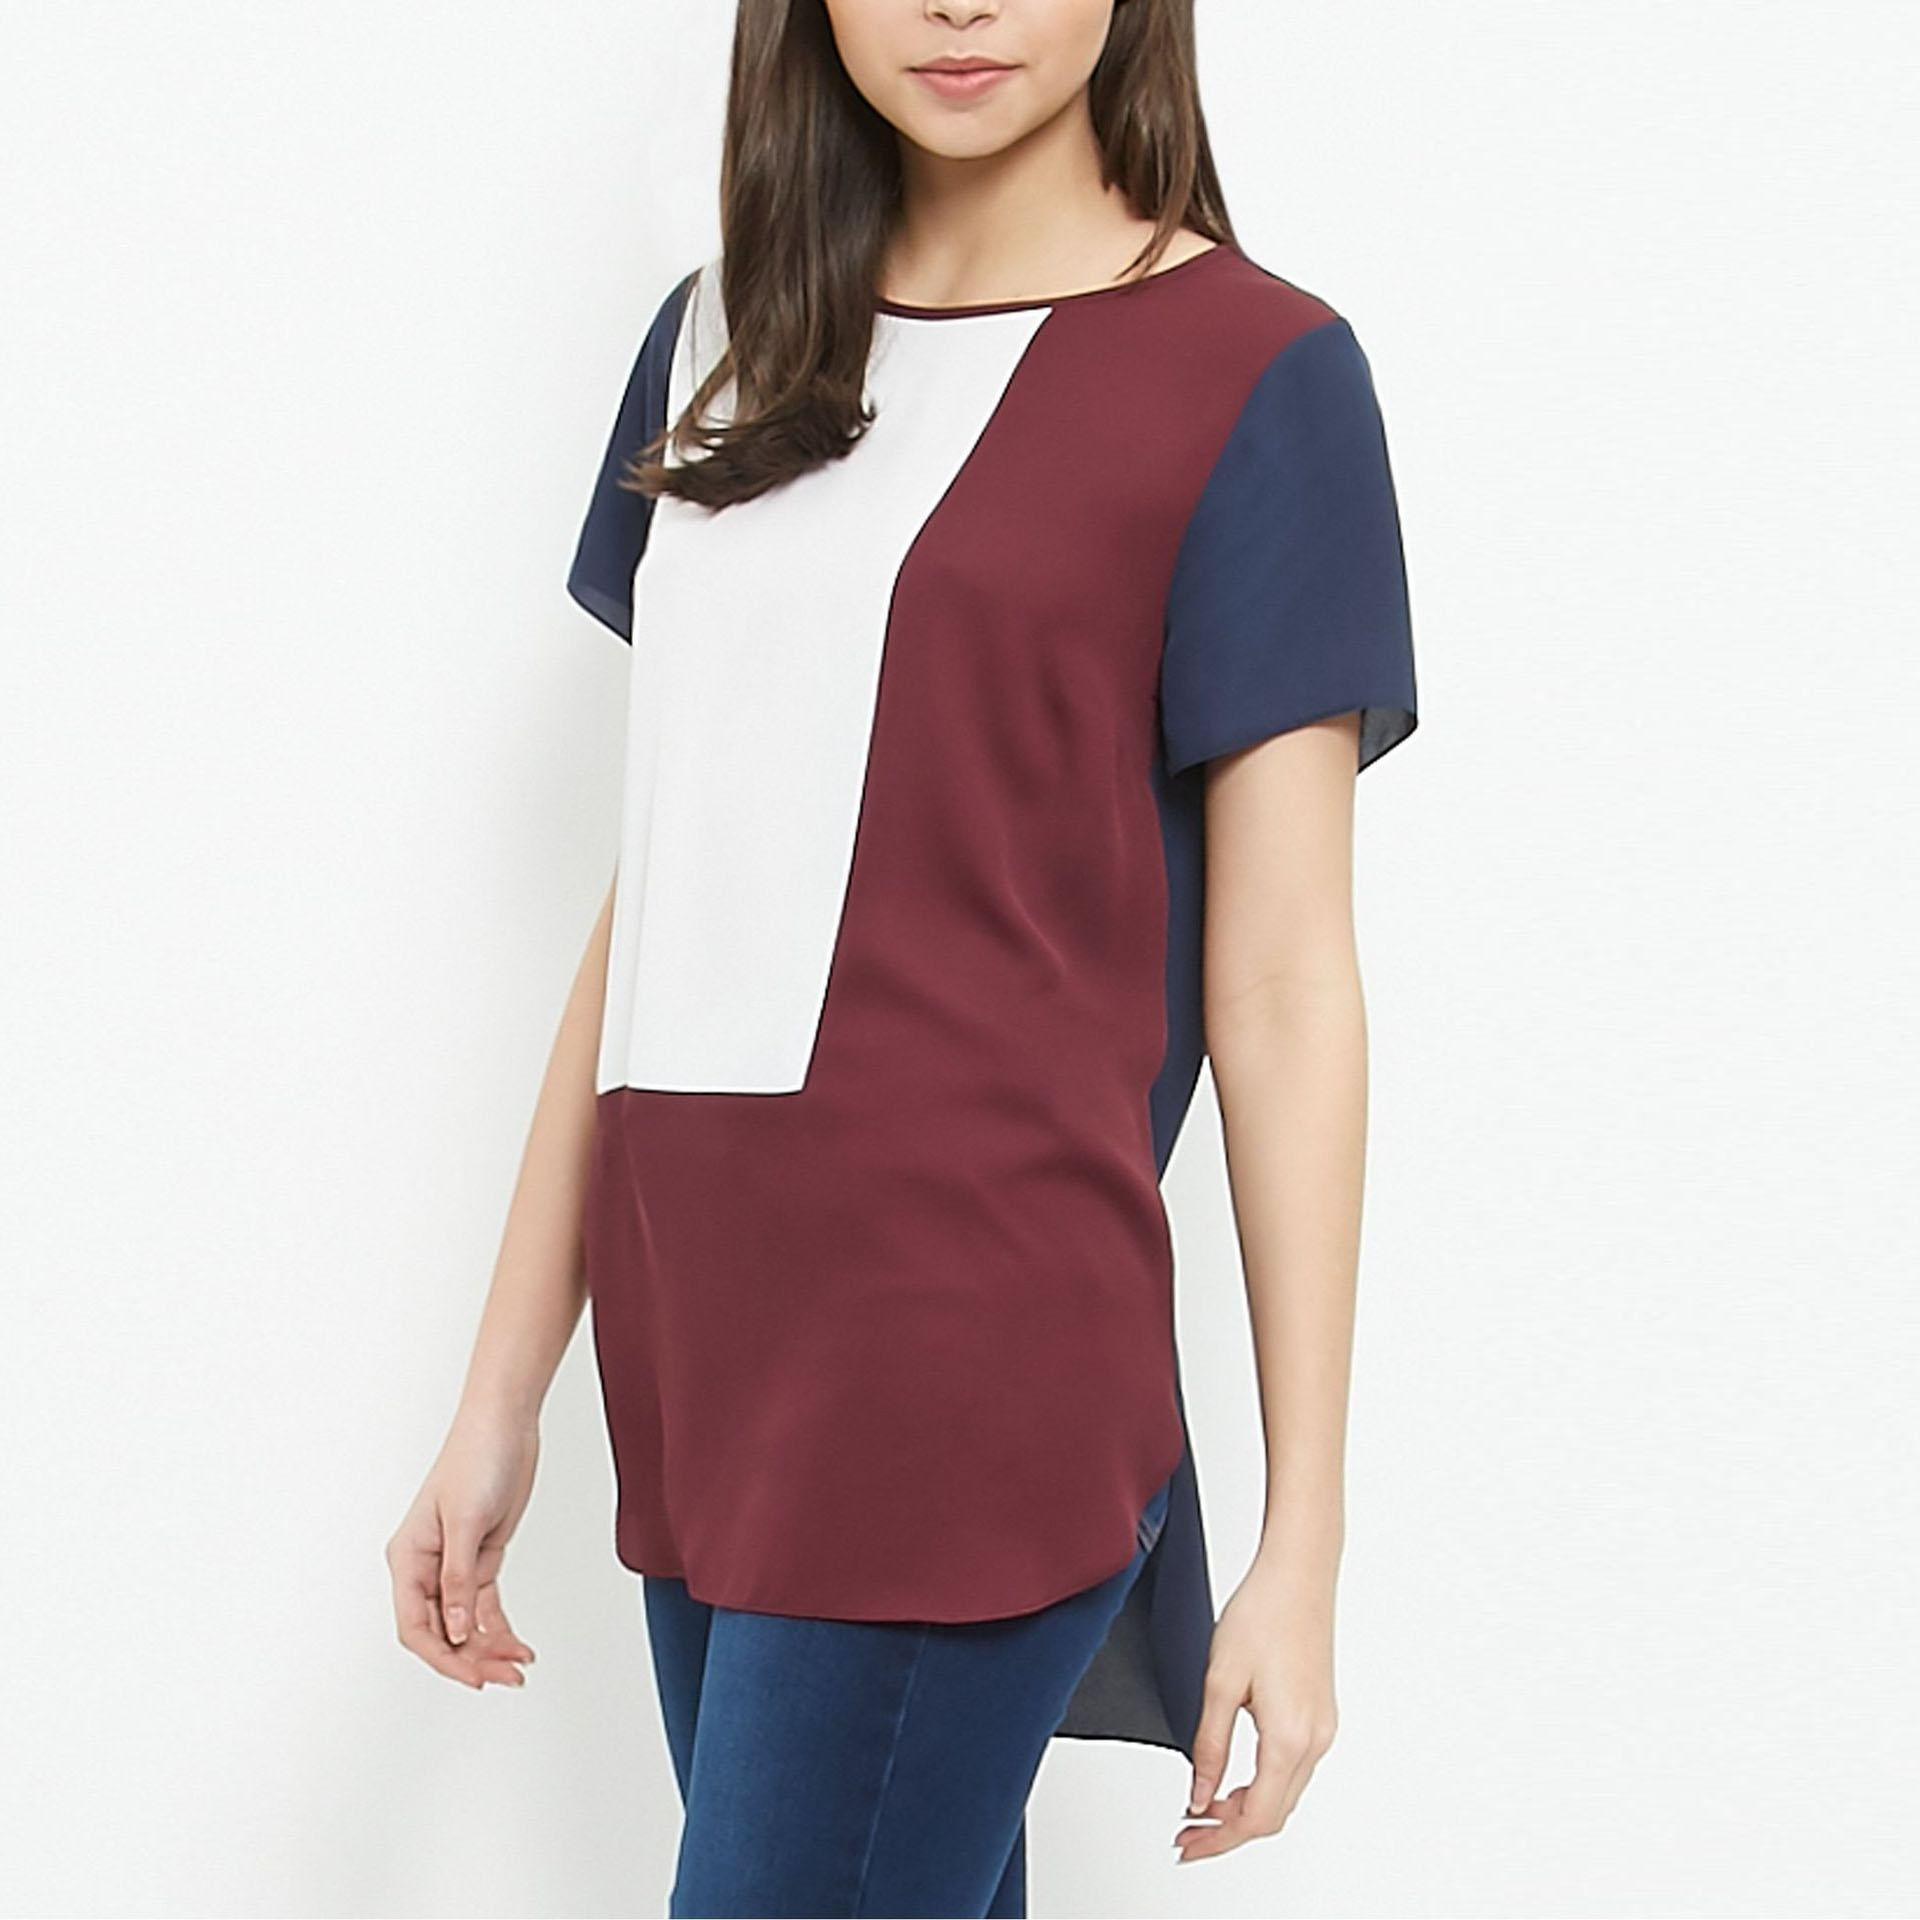 b3edc1cc54e 2019 2017 Summer Plus Size 6XL Loose Casual Long Chiffon Shirts Blouse For  Women Patchwork 5XL 6XL Tops Shirt From Applegloves